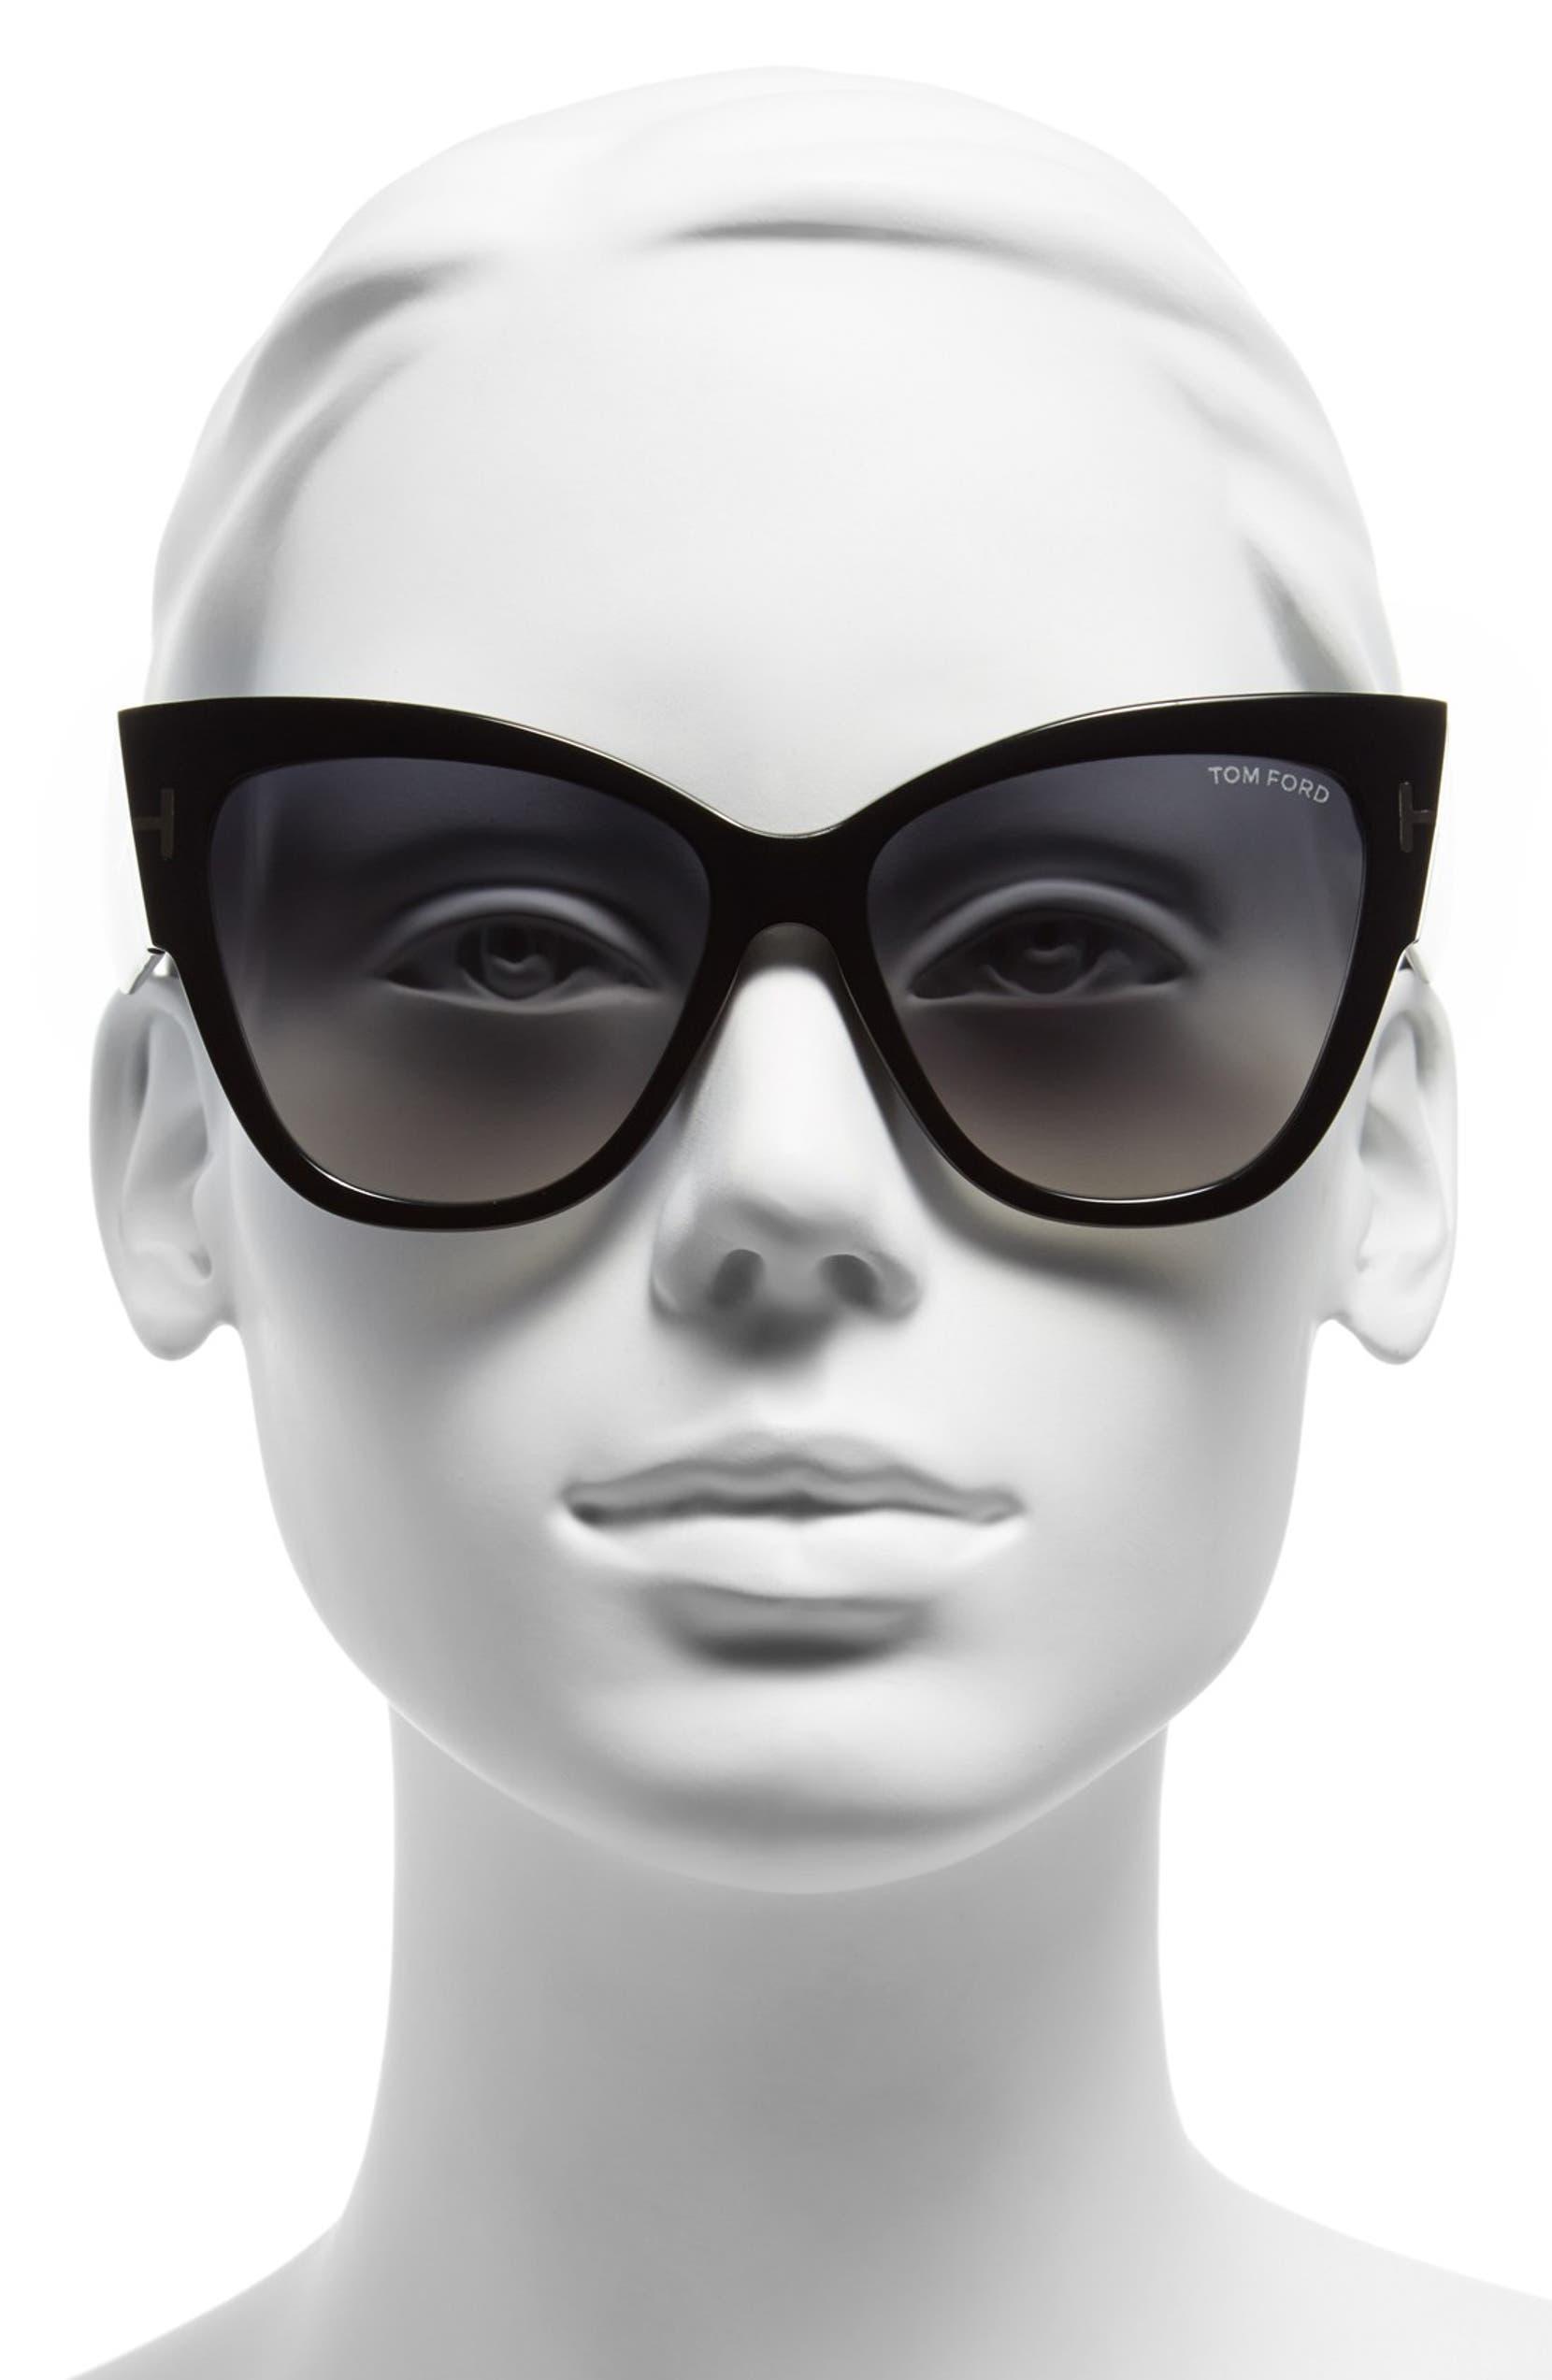 777e545f1fa Tom Ford Anoushka 57mm Gradient Cat Eye Sunglasses